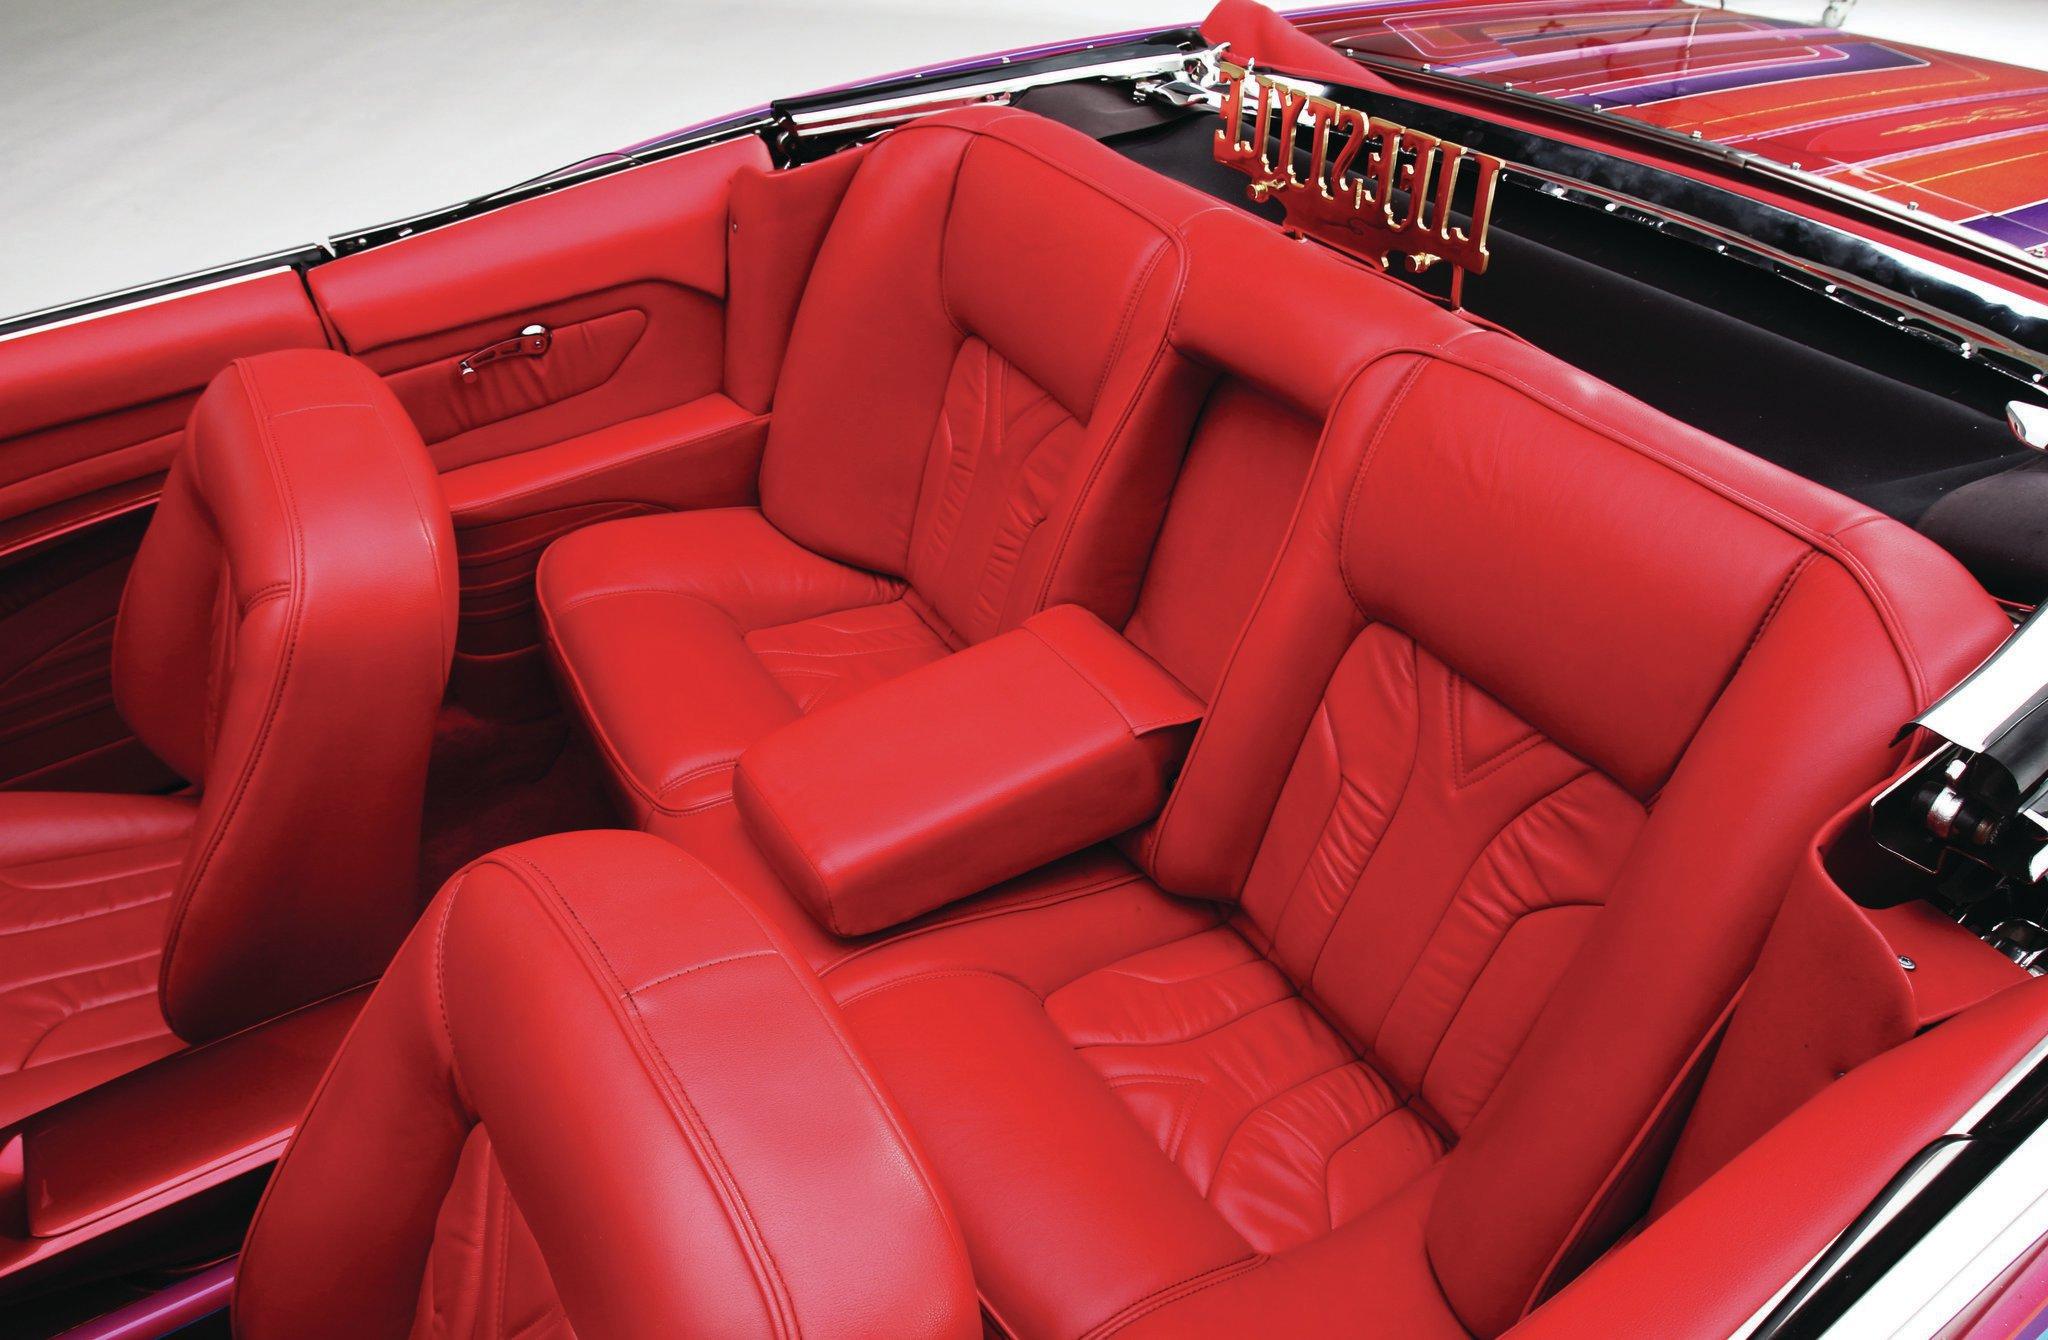 1965 Chevrolet Impala Convertible Love Street